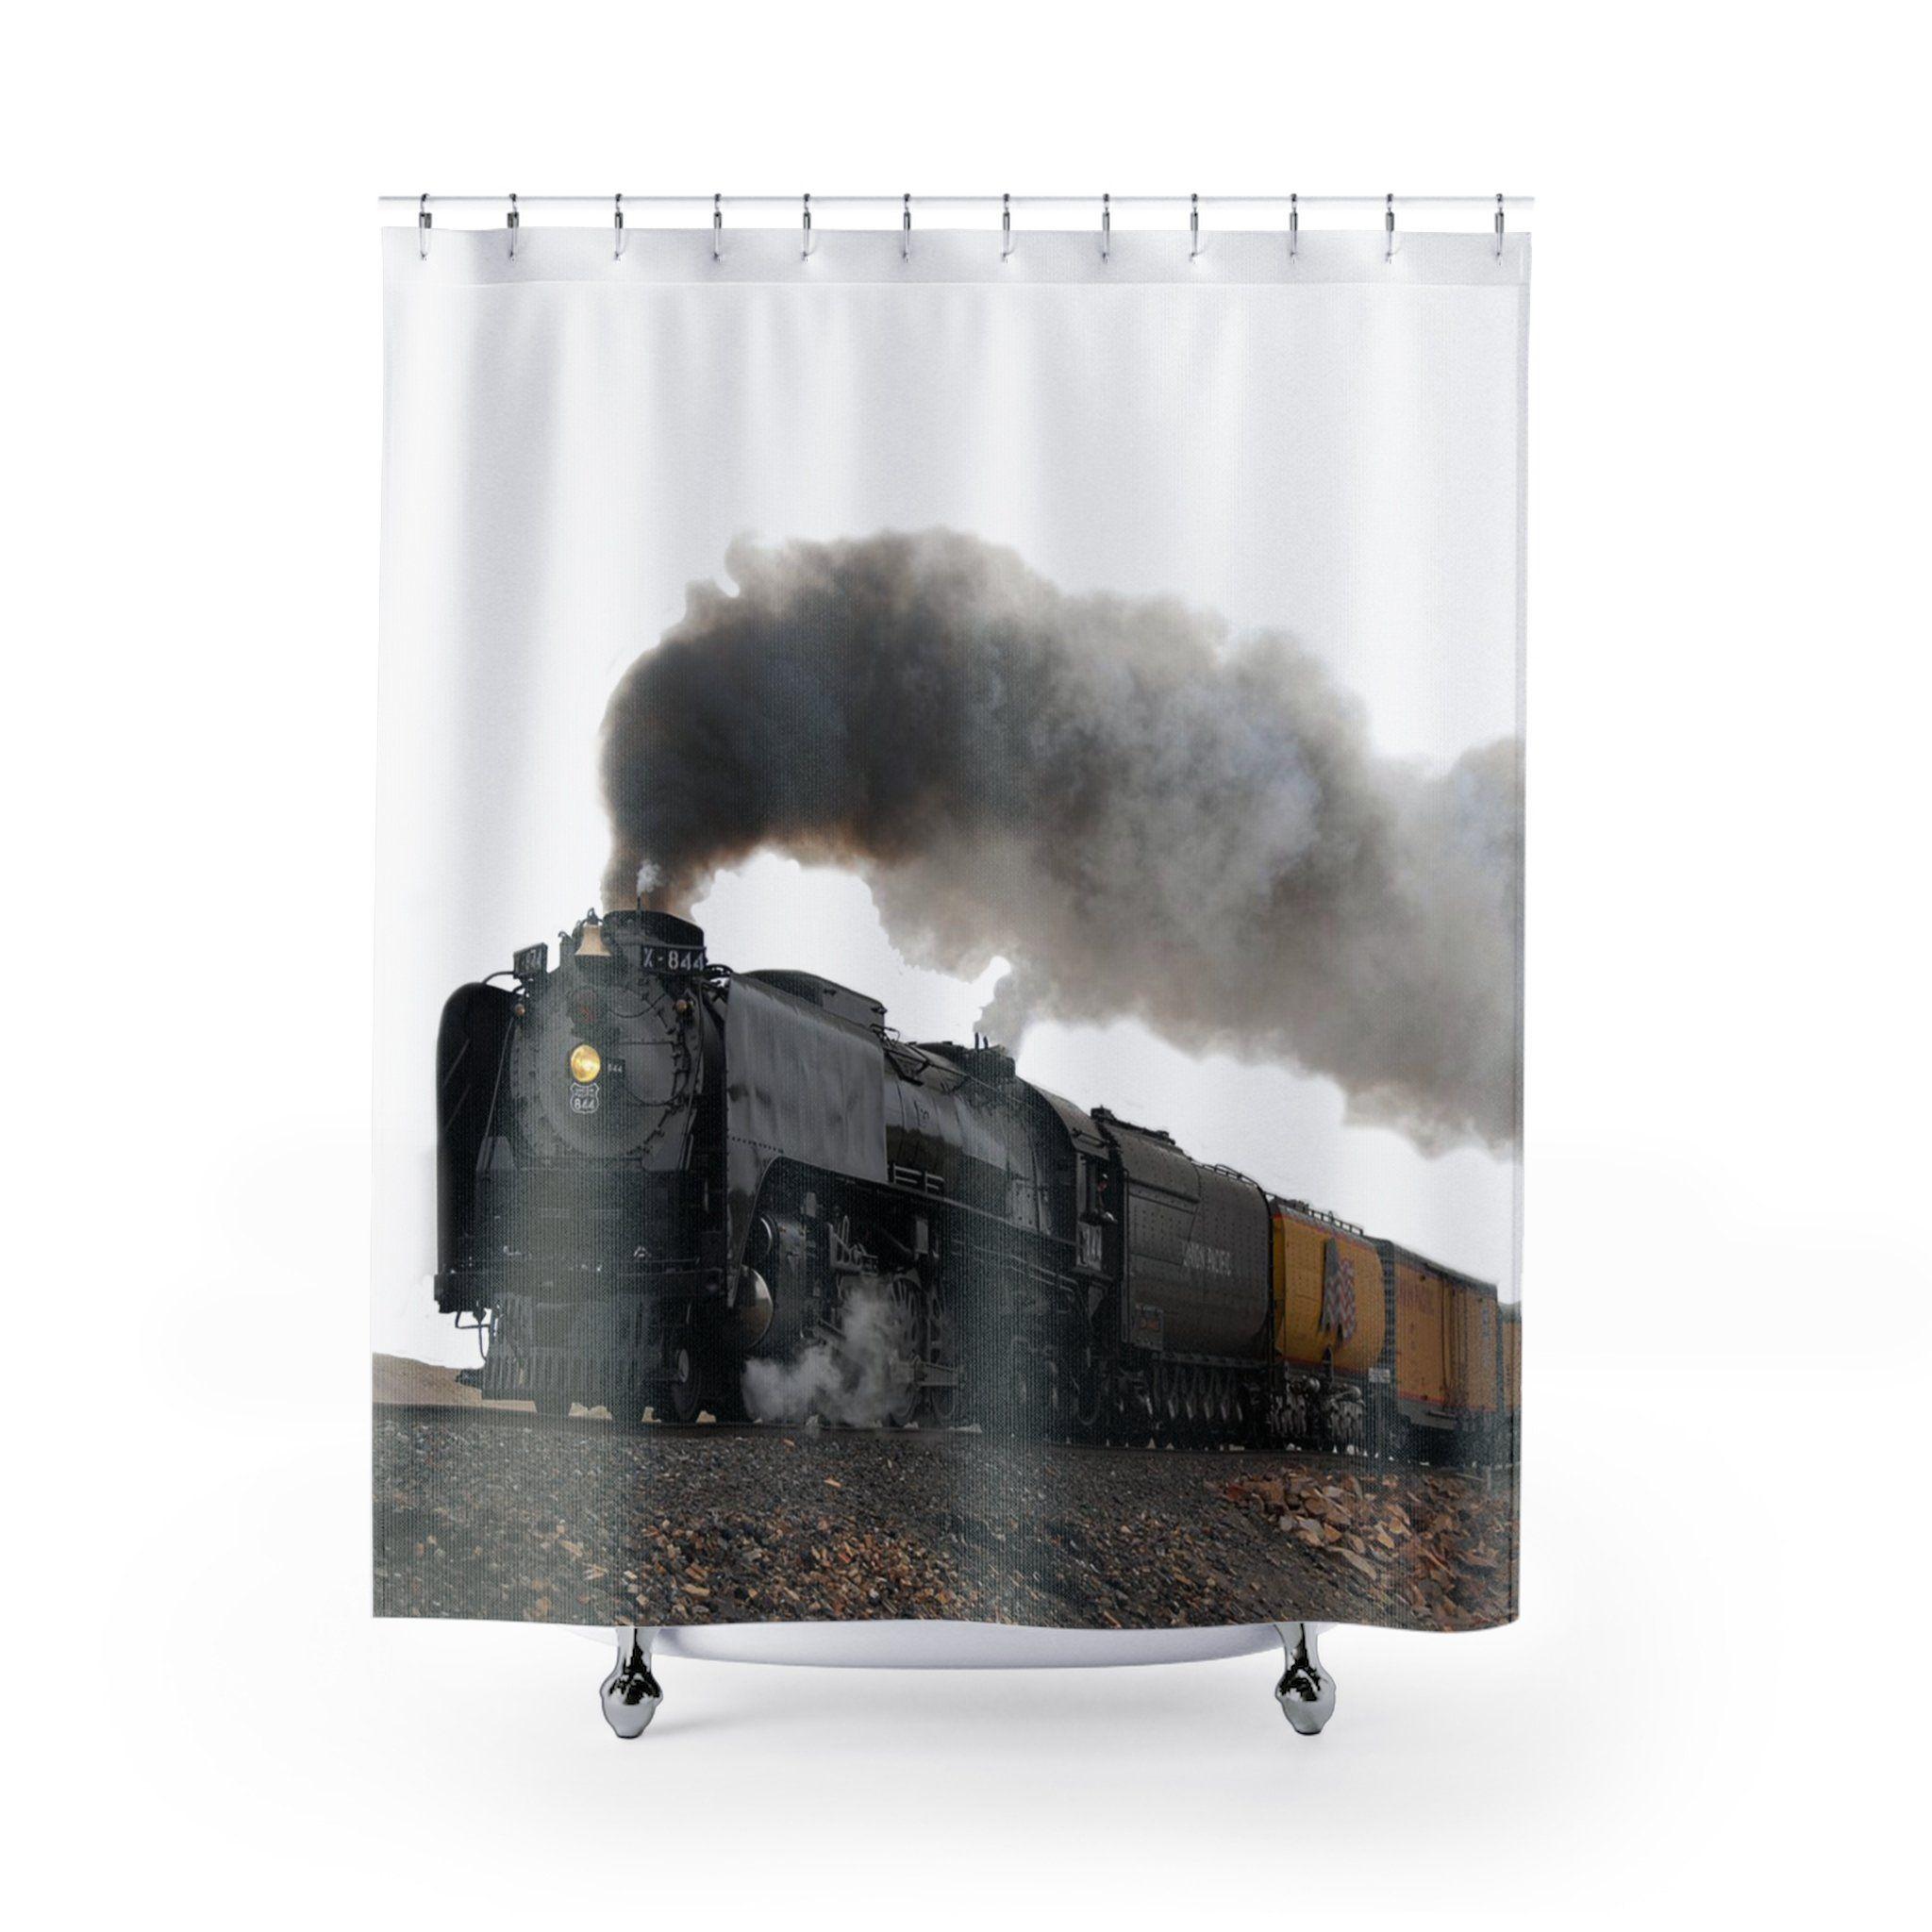 Train Shower Curtain Shower Curtain Curtains Shower